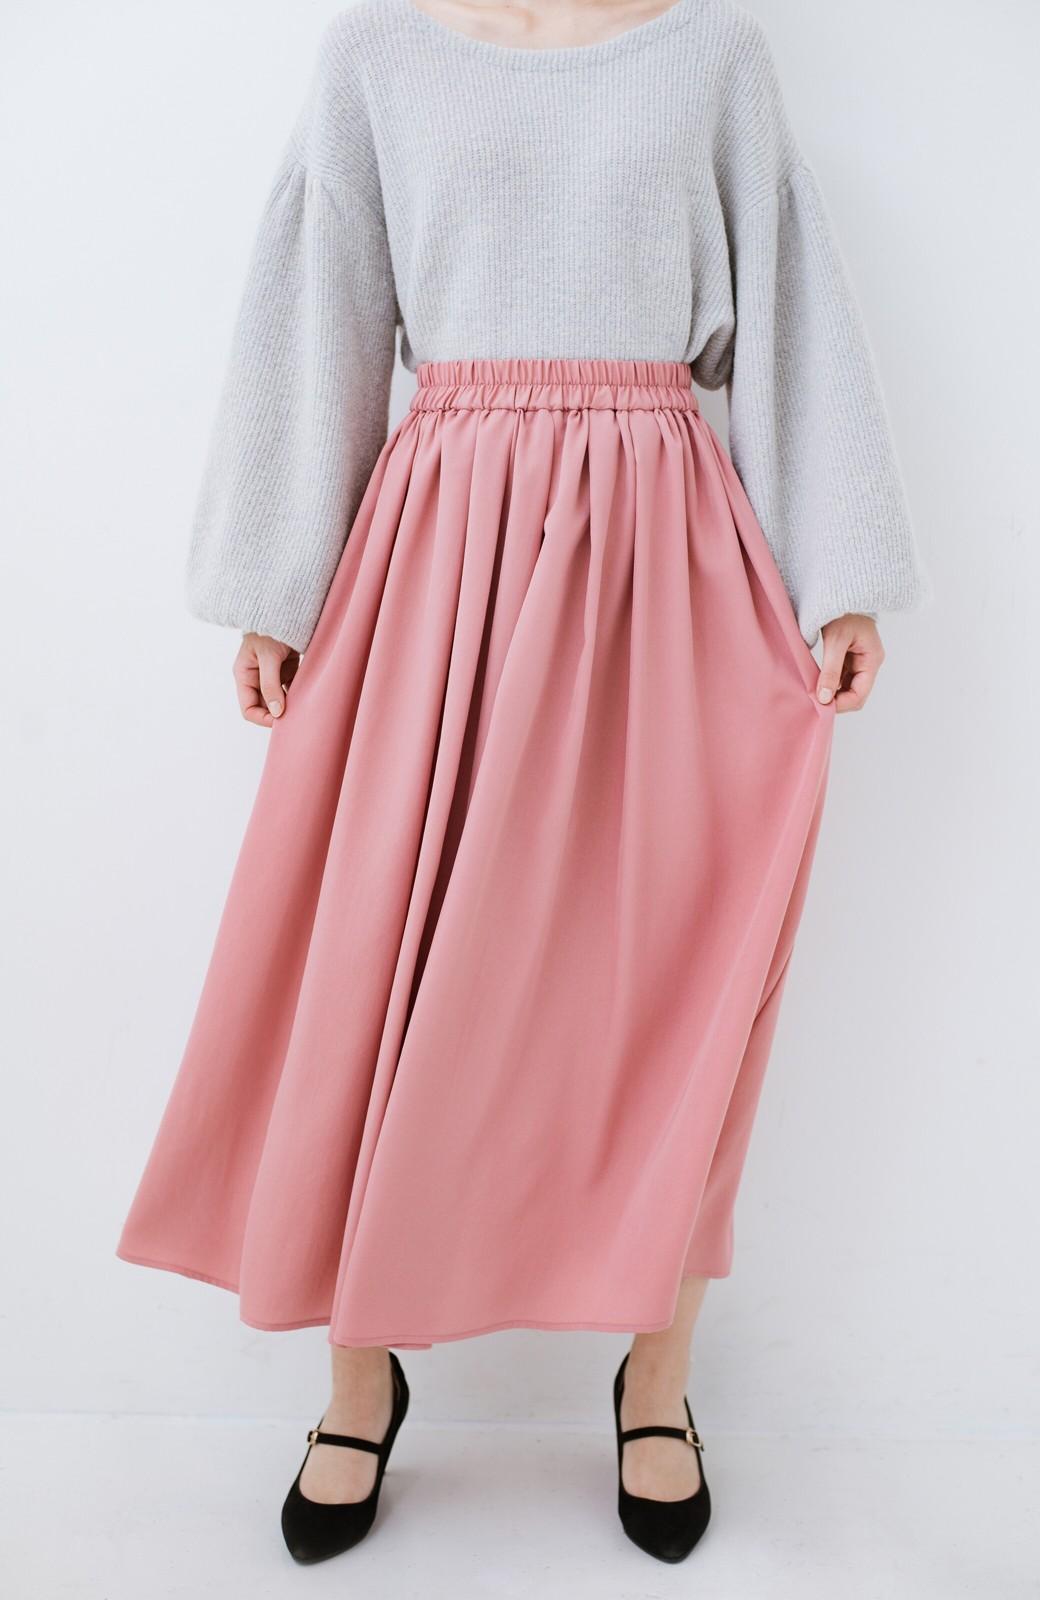 haco! きれいなお姉さんになれる気がするミモレ丈フレアースカート <ピンク>の商品写真4